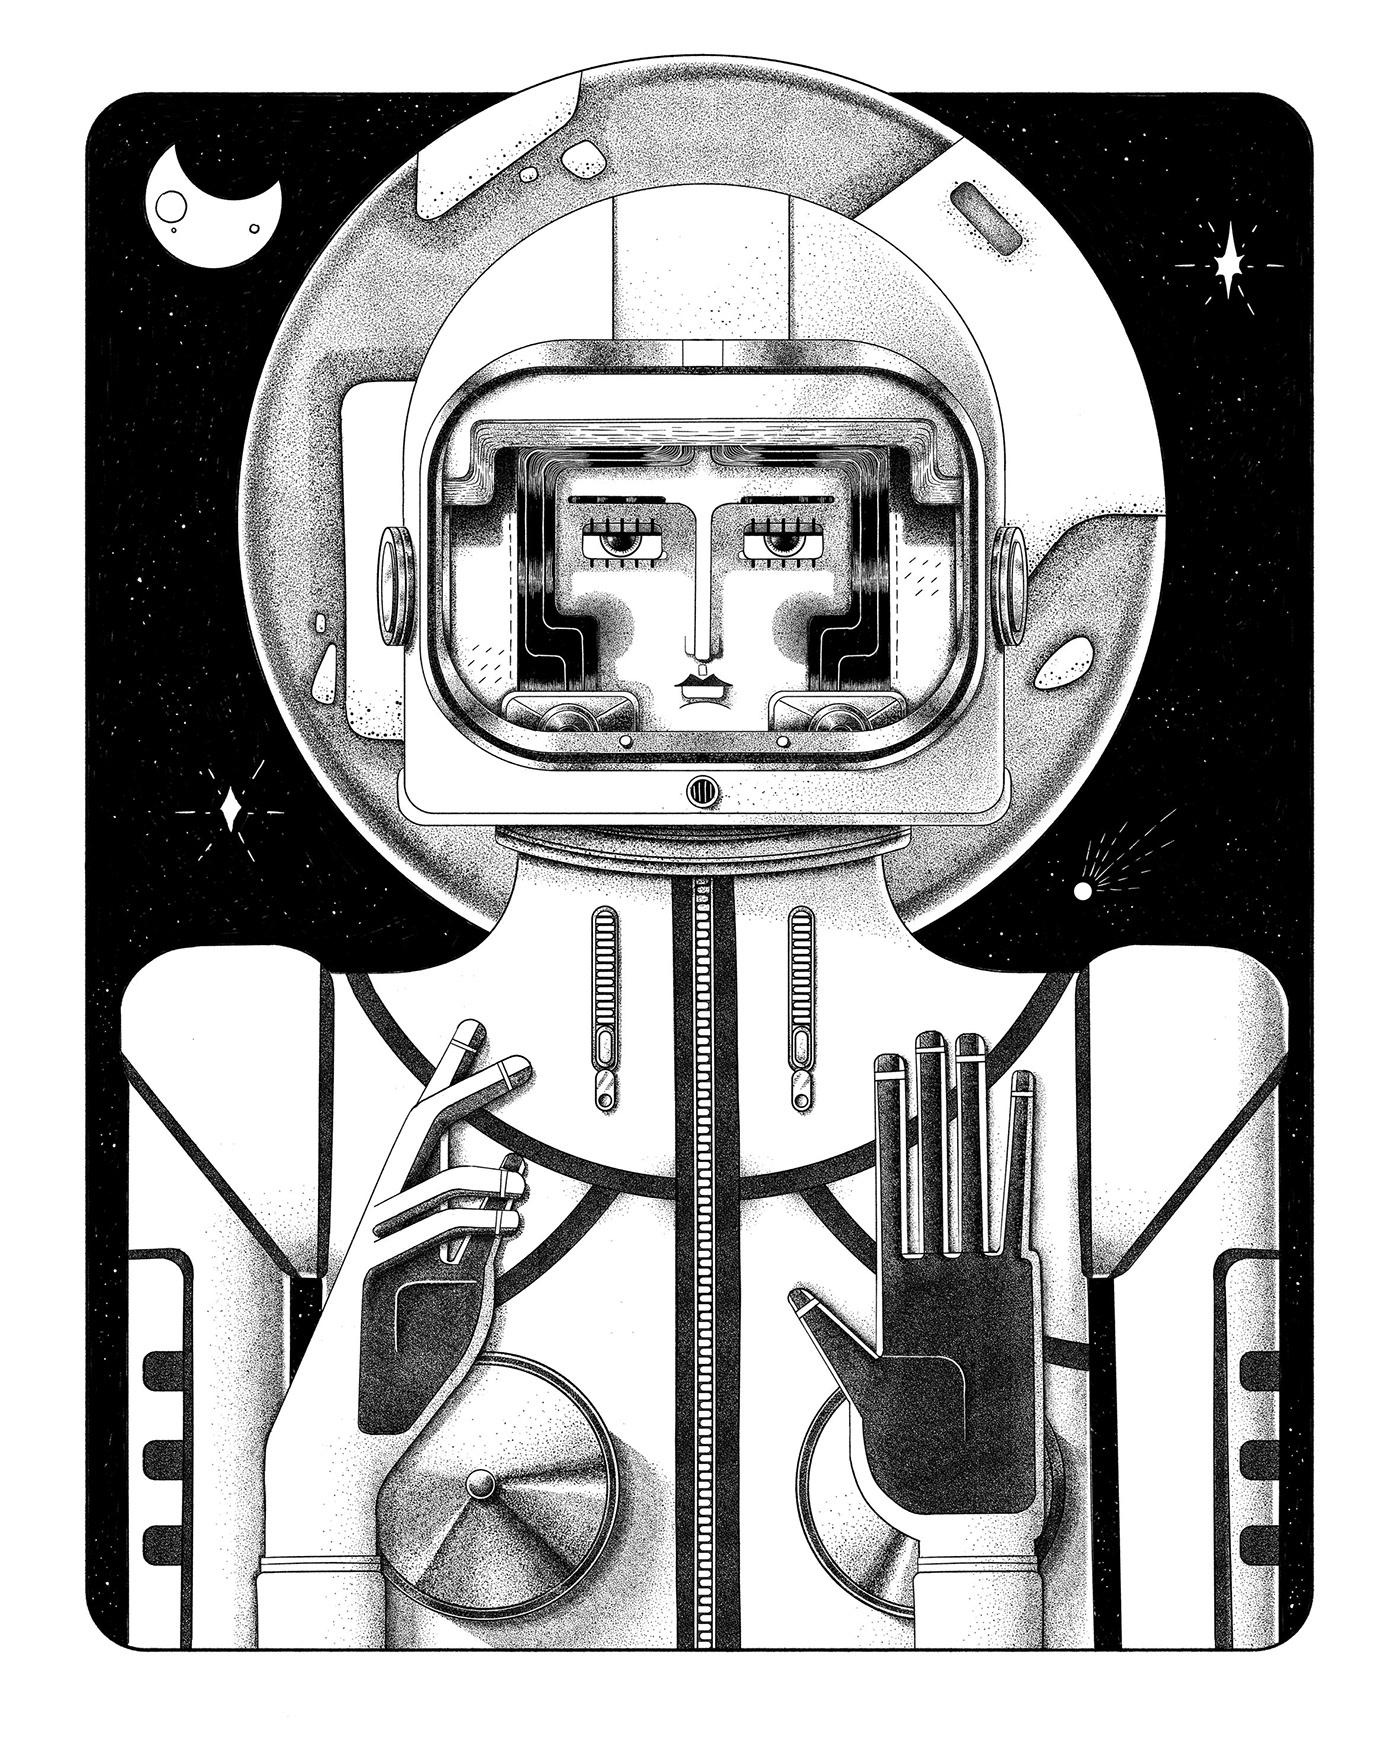 Lub One Иллюстрация, Цифровое искусство, Дизайн персонажей (7).jpg